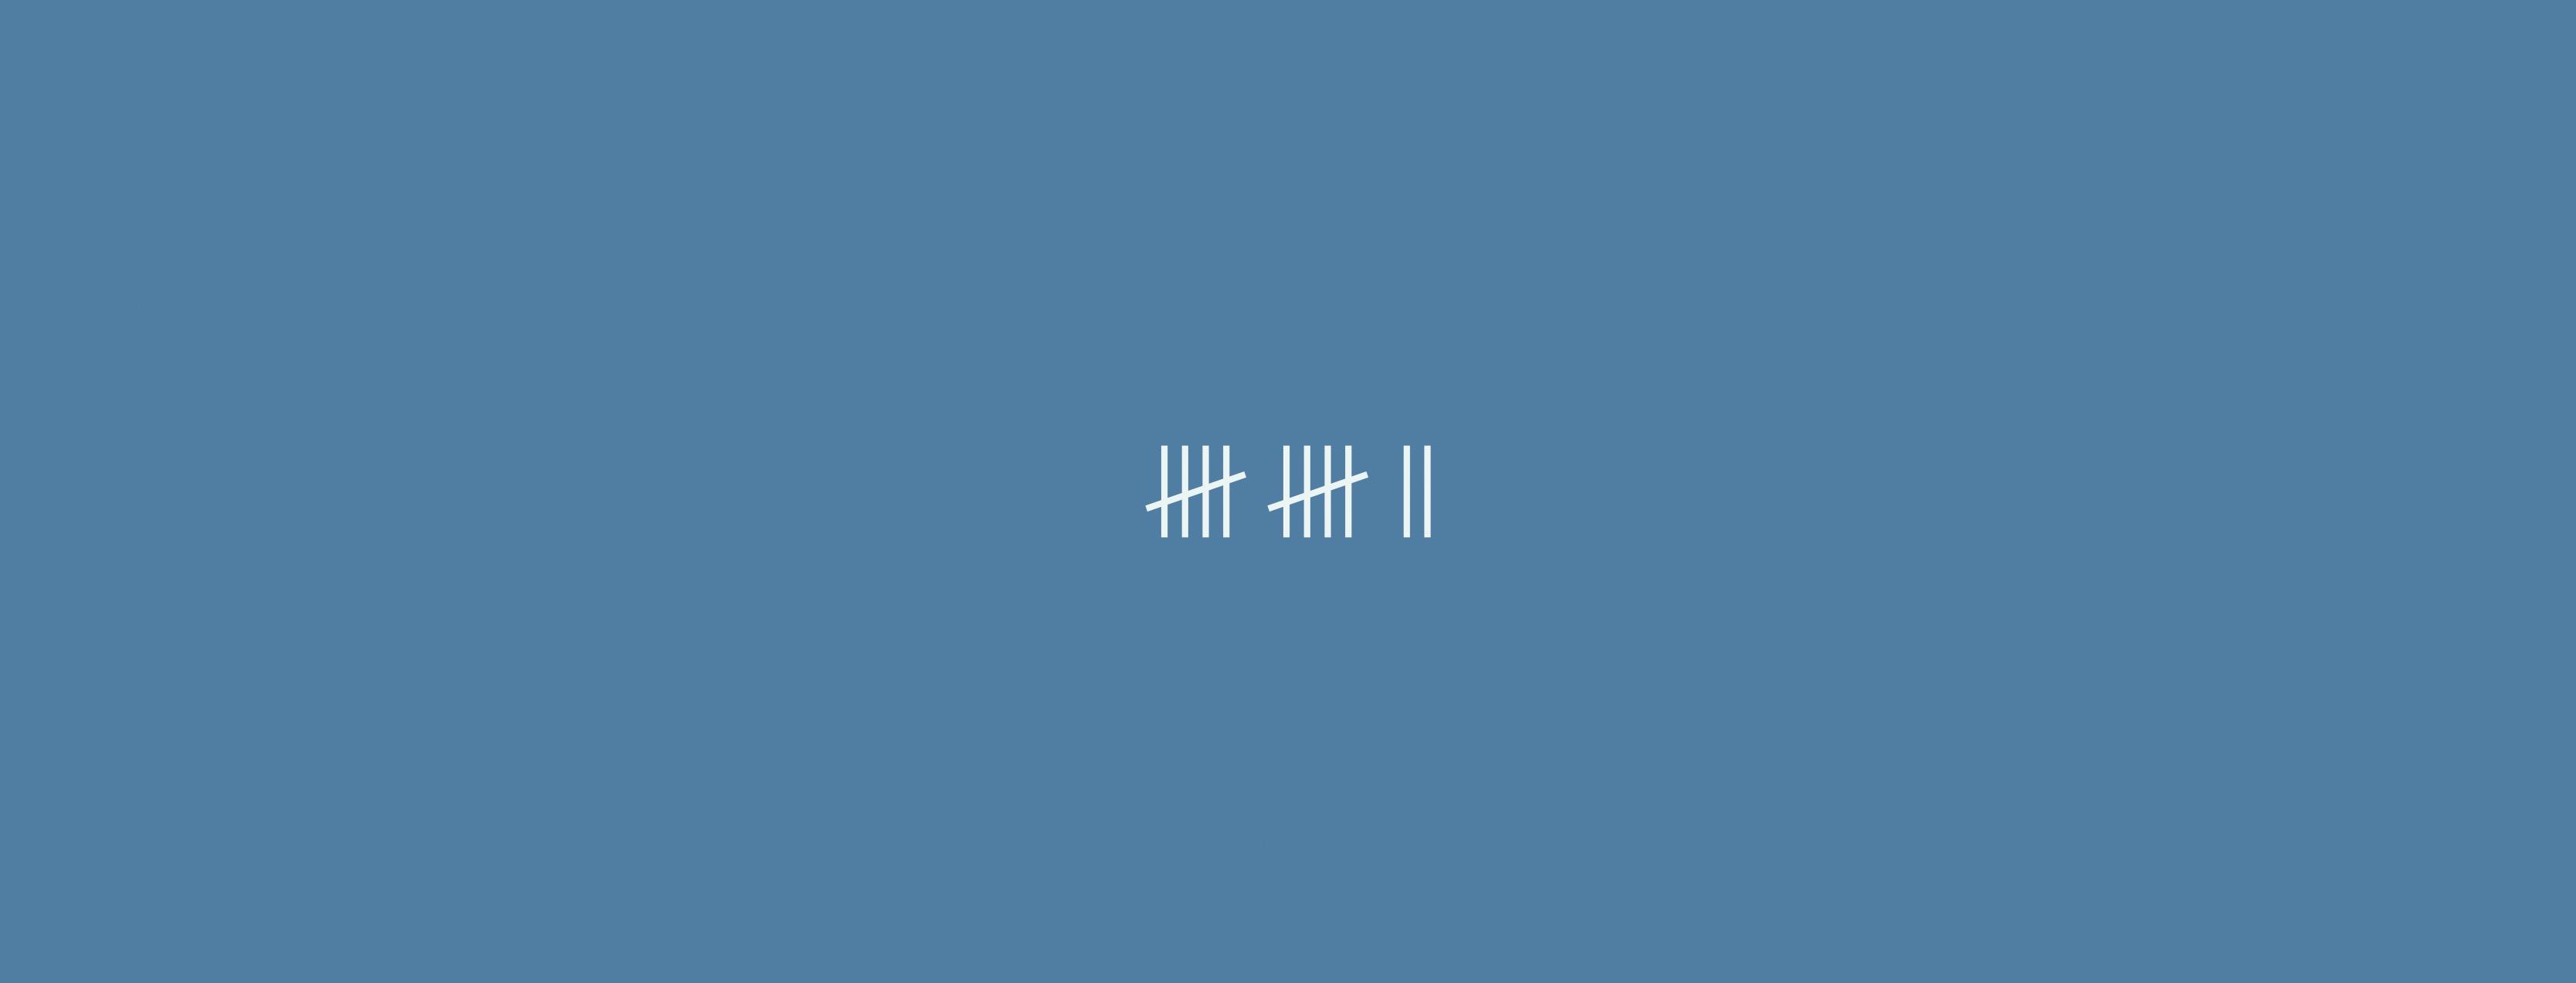 hamabi_logo_1